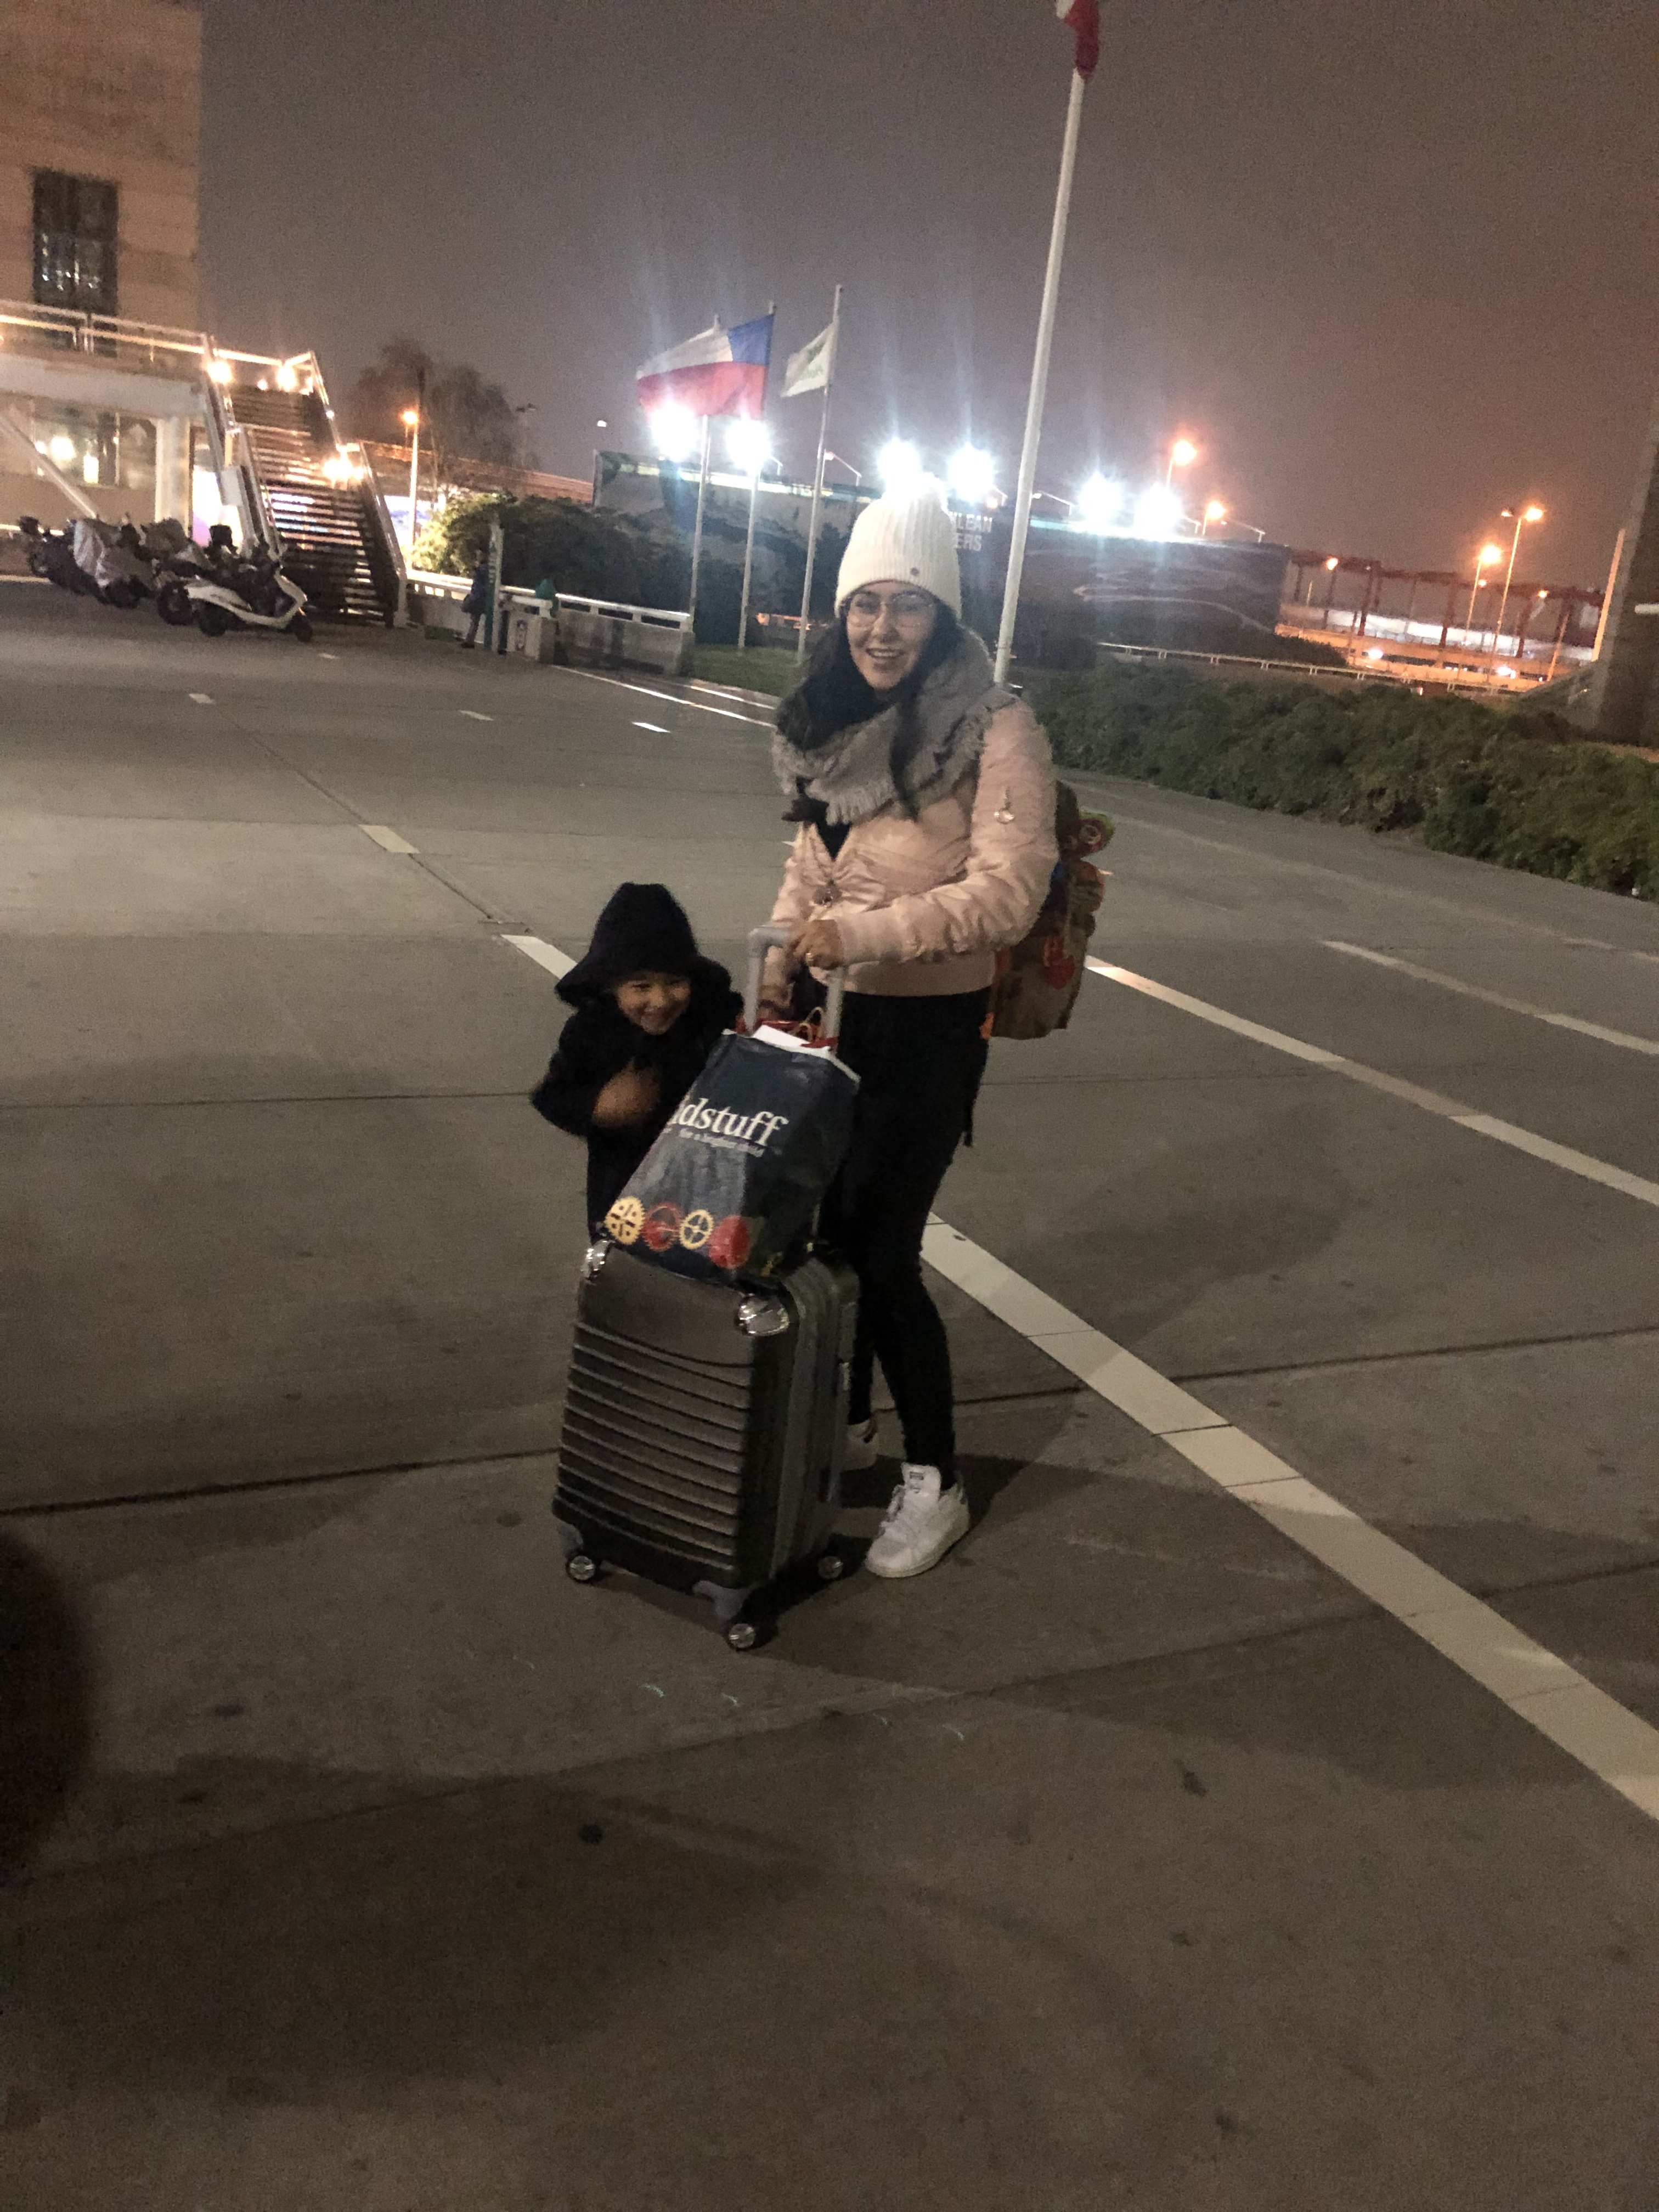 santiago chile aeroporto